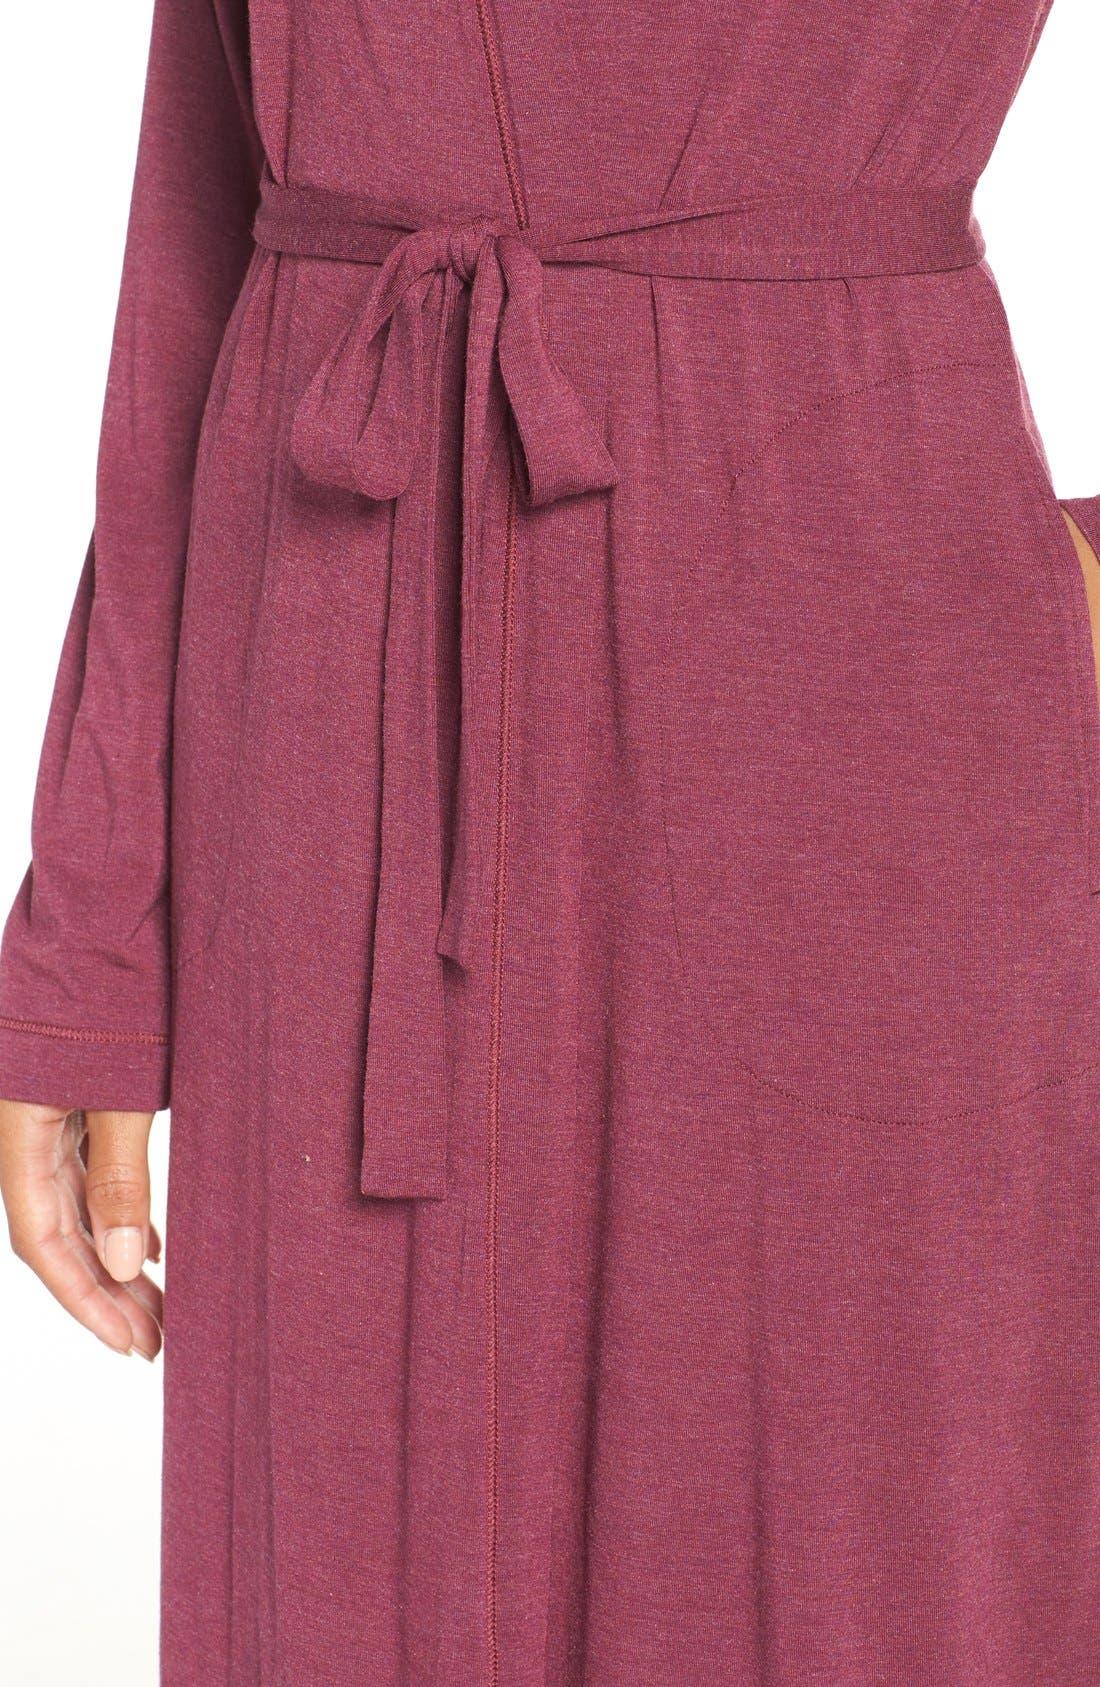 'City Essentials' Short Robe,                             Alternate thumbnail 28, color,